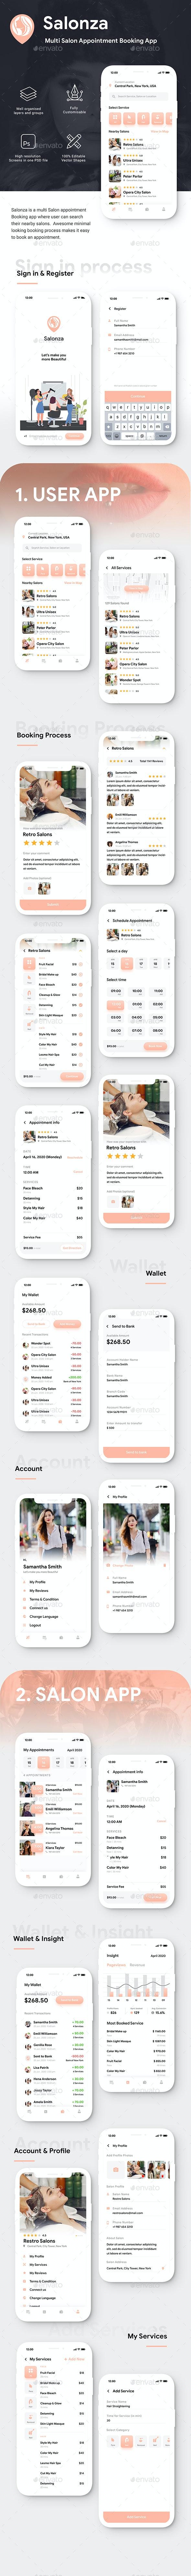 Multi Salon Appointment Booking App | User & Salon App UI Kit | Salonza - User Interfaces Web Elements